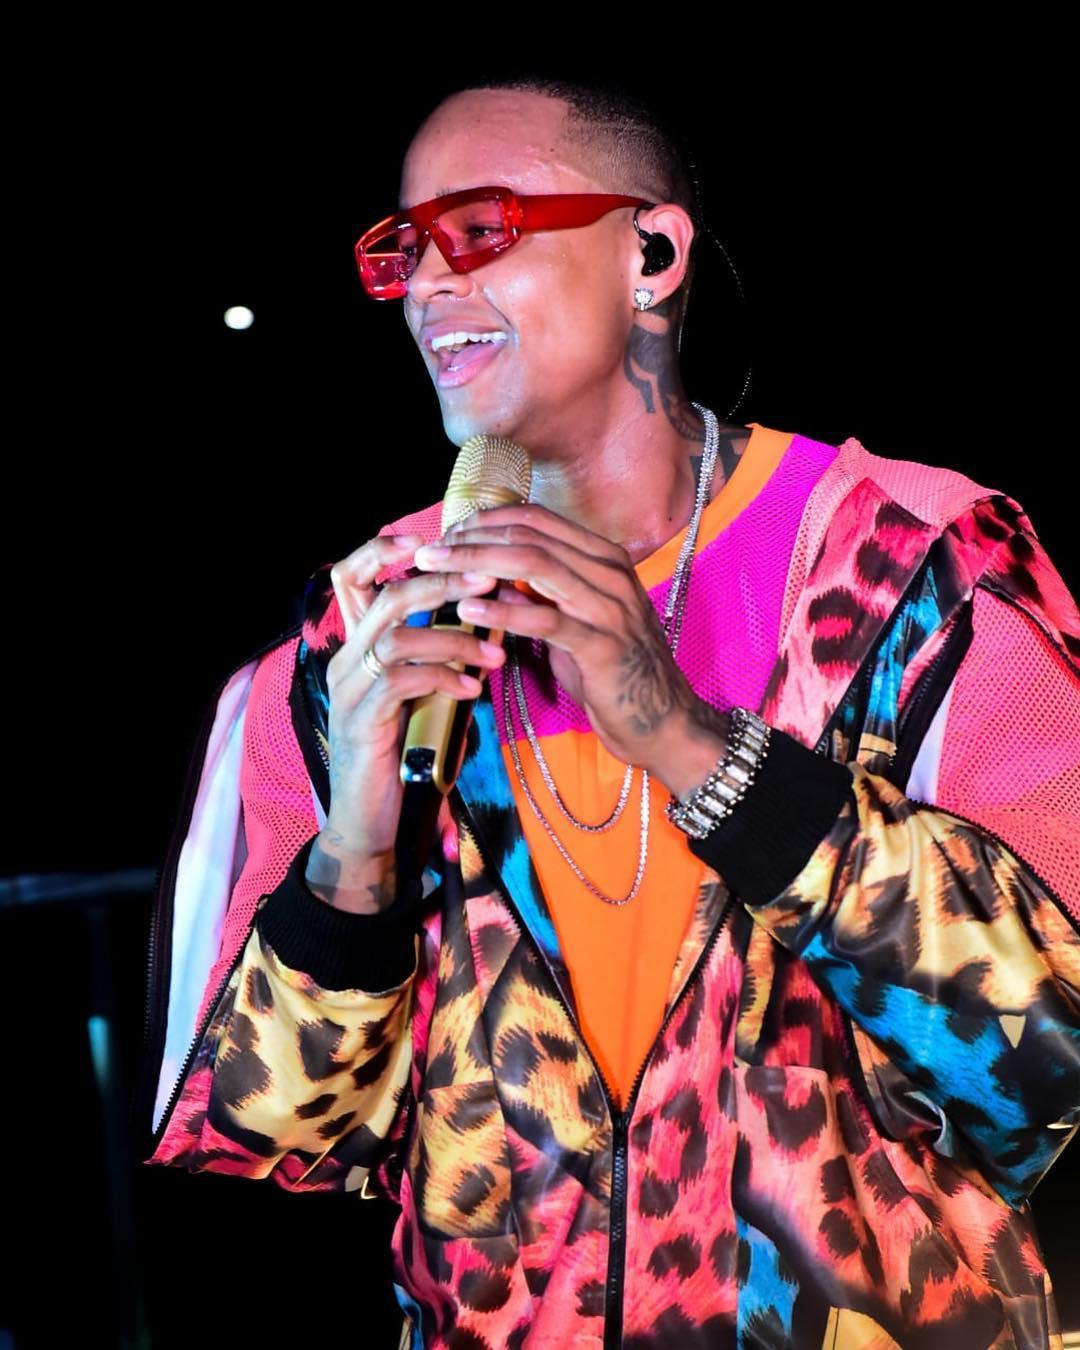 Léo Santana foi o artista mais visto na TV durante o Carnaval 41